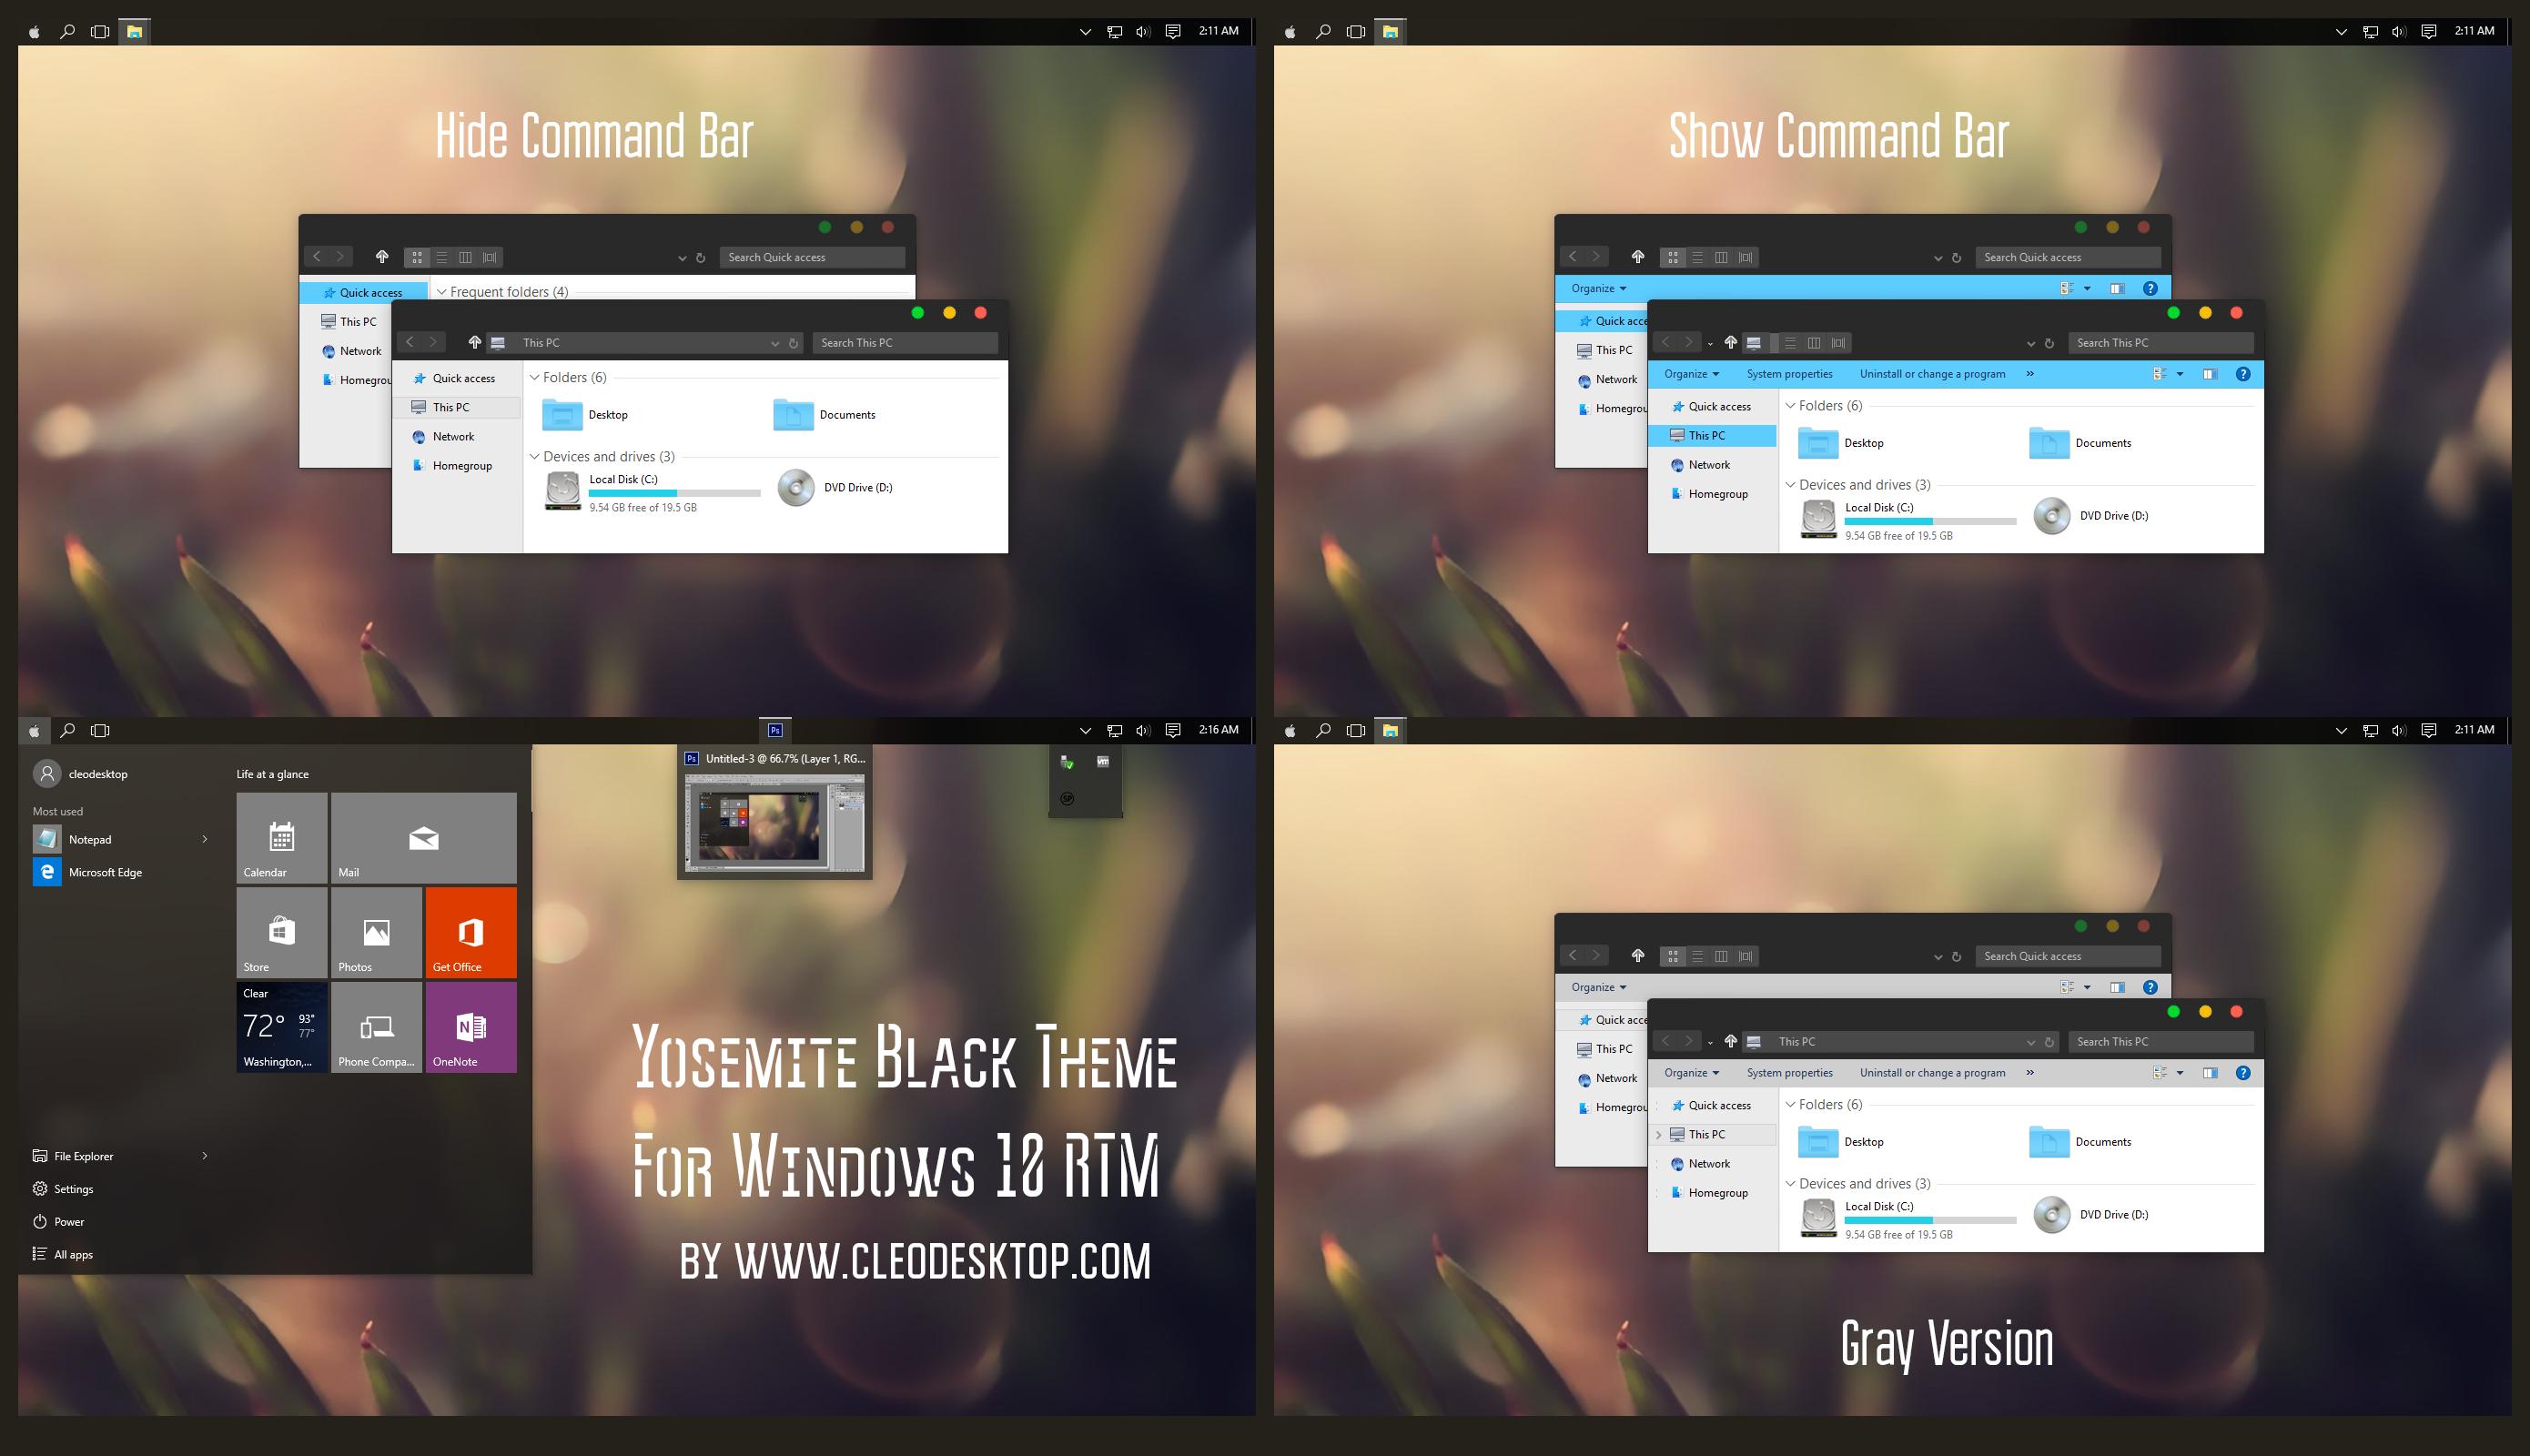 Yosemite Black Full Version Theme Windows 10 RTM